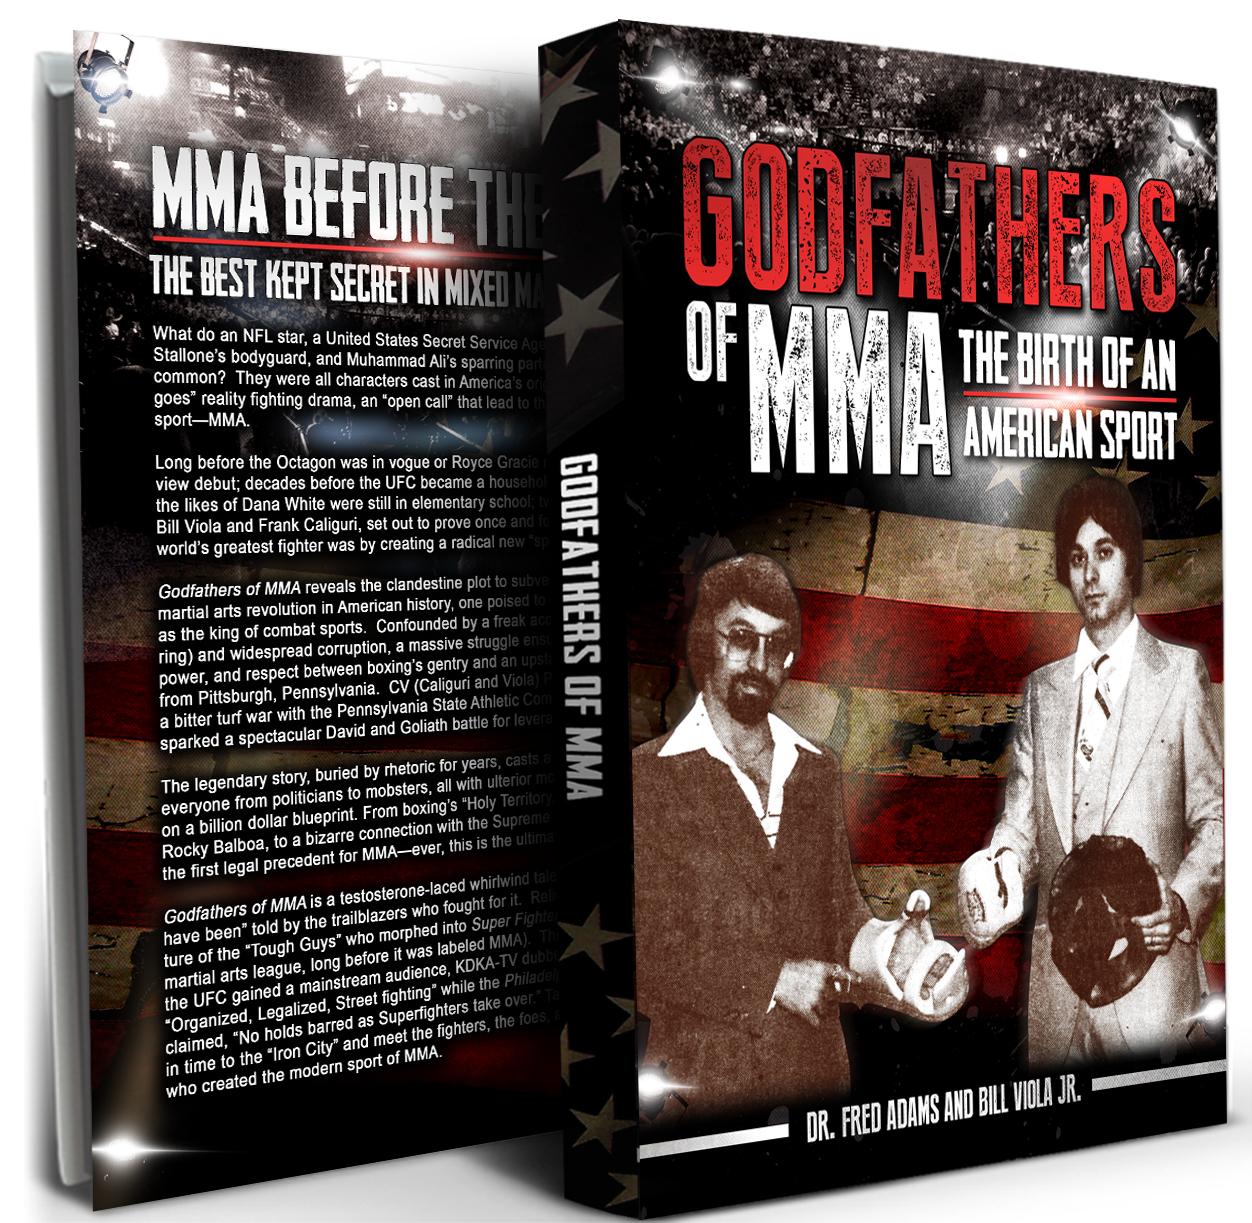 Godfathers of mma book pittsburgh fitness expo godfathers of mma bill viola jr malvernweather Choice Image